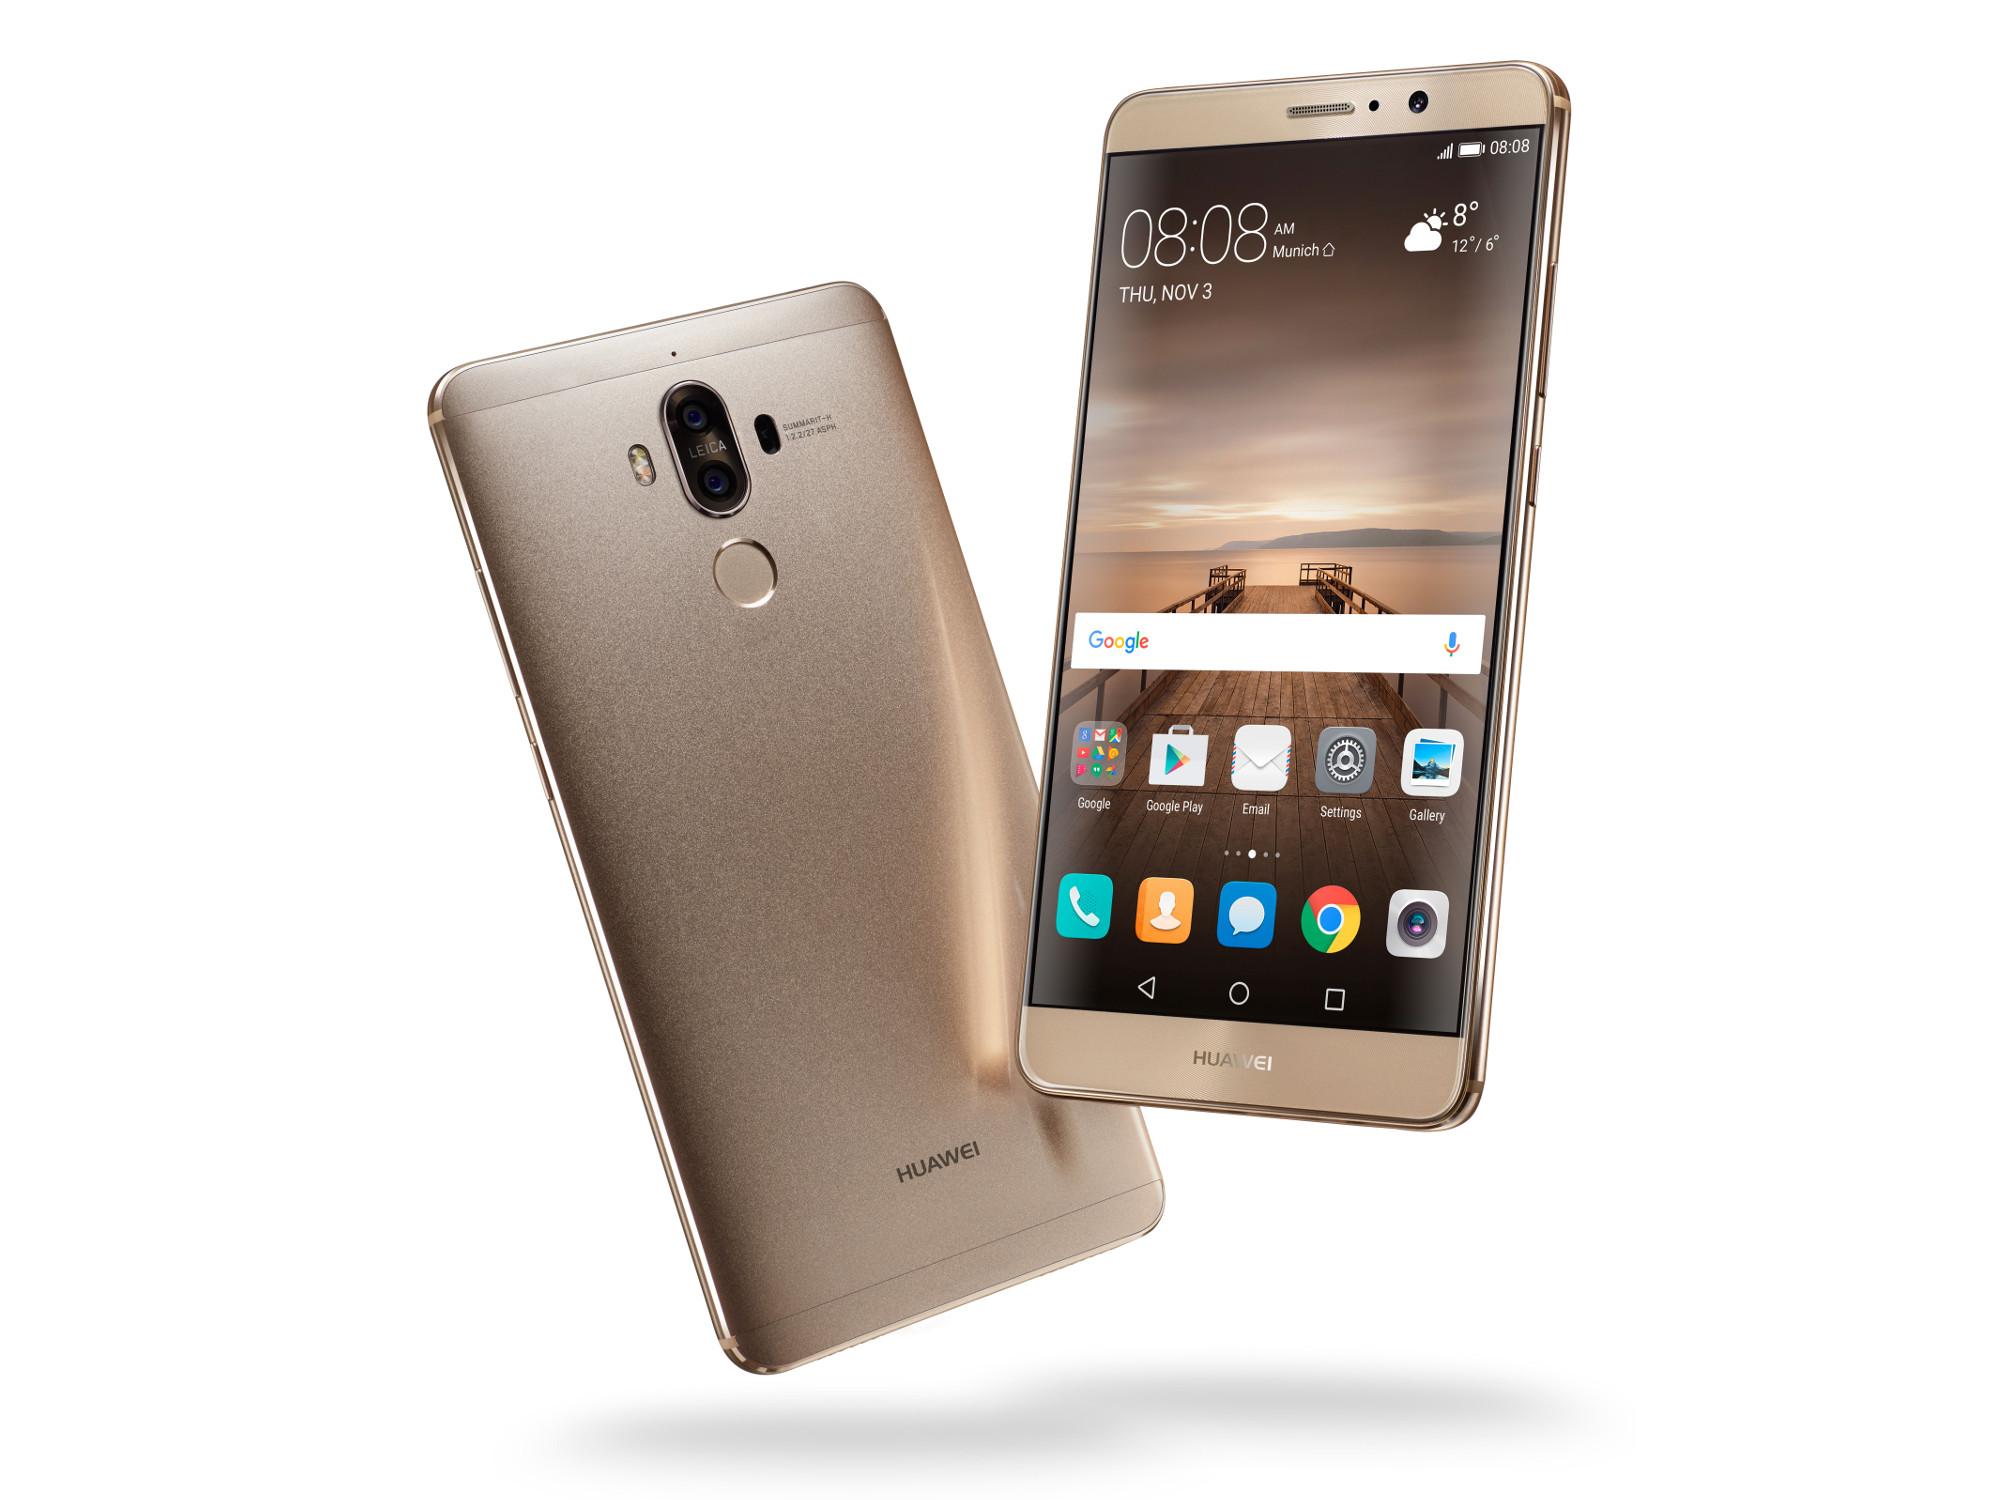 Huawei Announces Mate 9 Smartphone with Kirin 960 and Dual-Lens Leica Camera